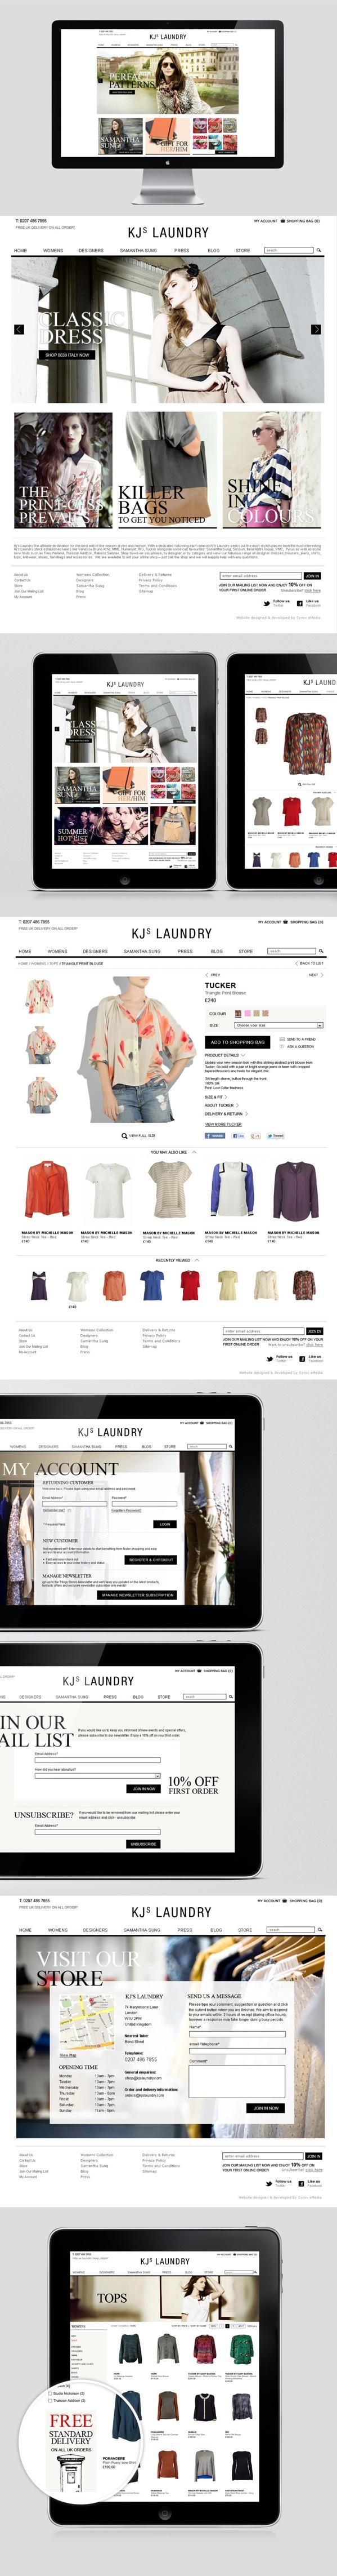 Cool #ecommercewebsite